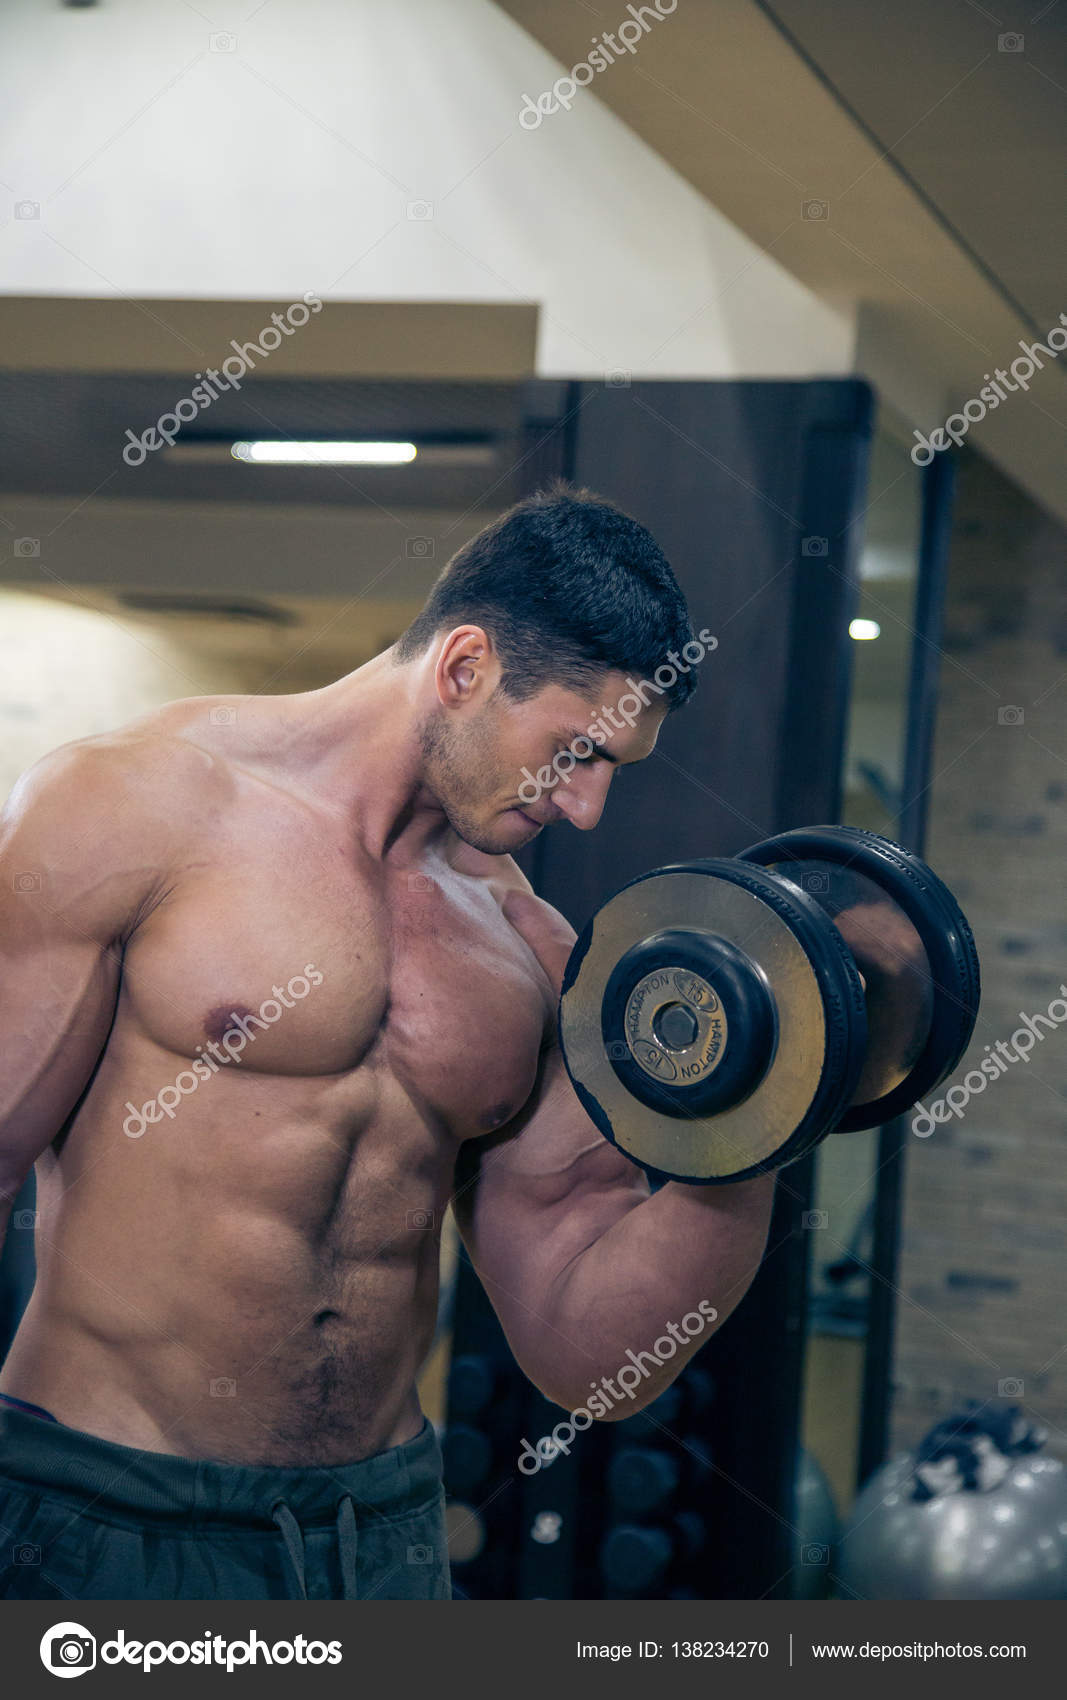 Shaking, Naked men exercise not